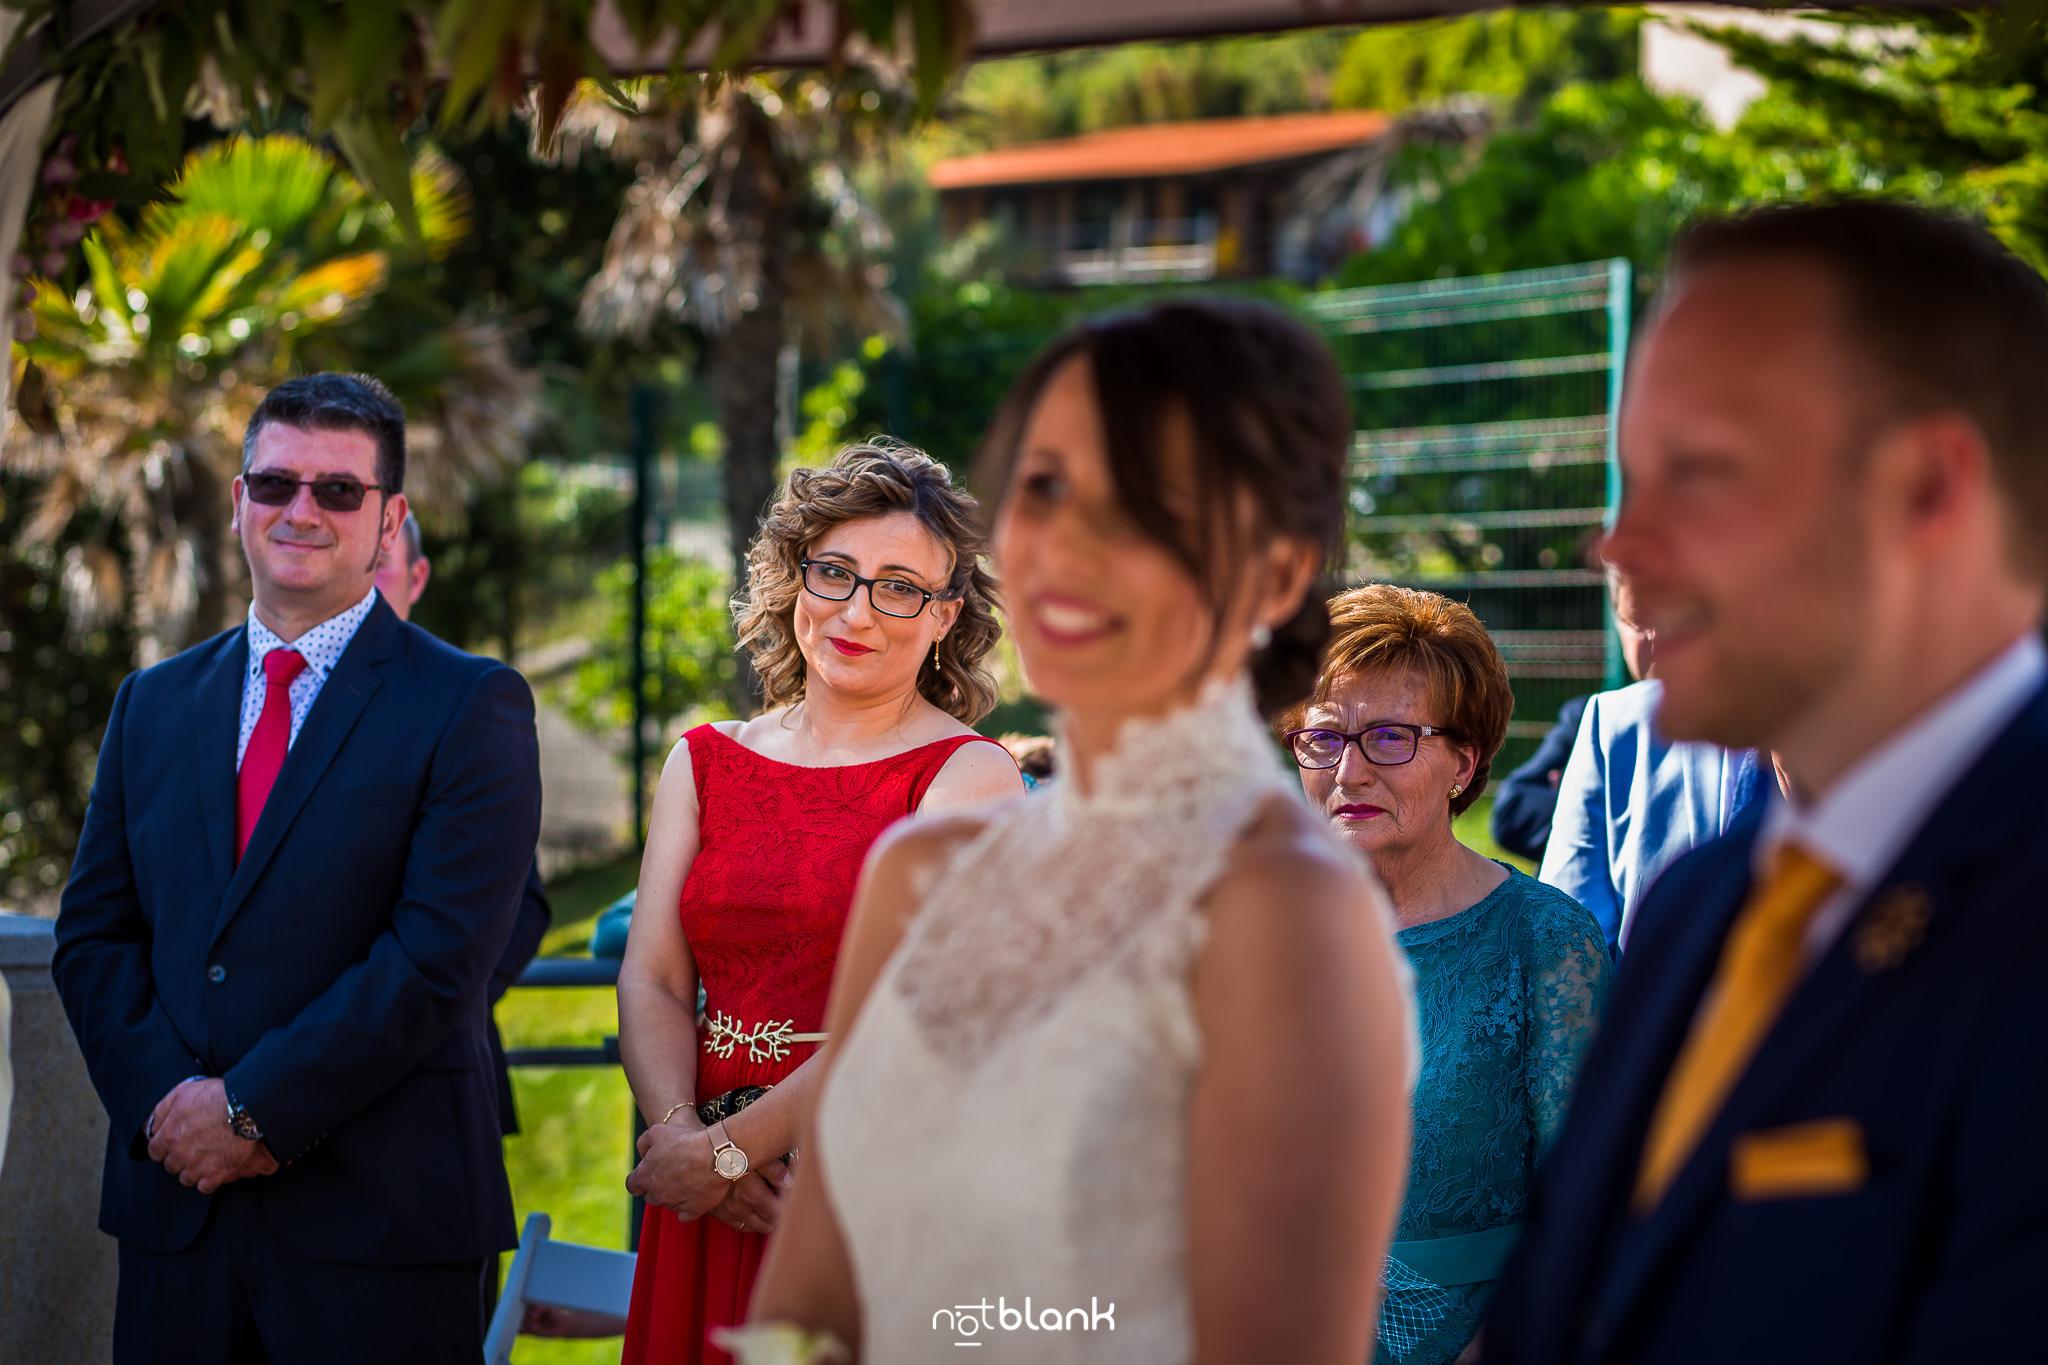 Boda-Maite-David-Hermana-De-La-Novia-Observa-A-Novios-En-El-Altar.Reportaje realizado por Notblank Fotografos de boda